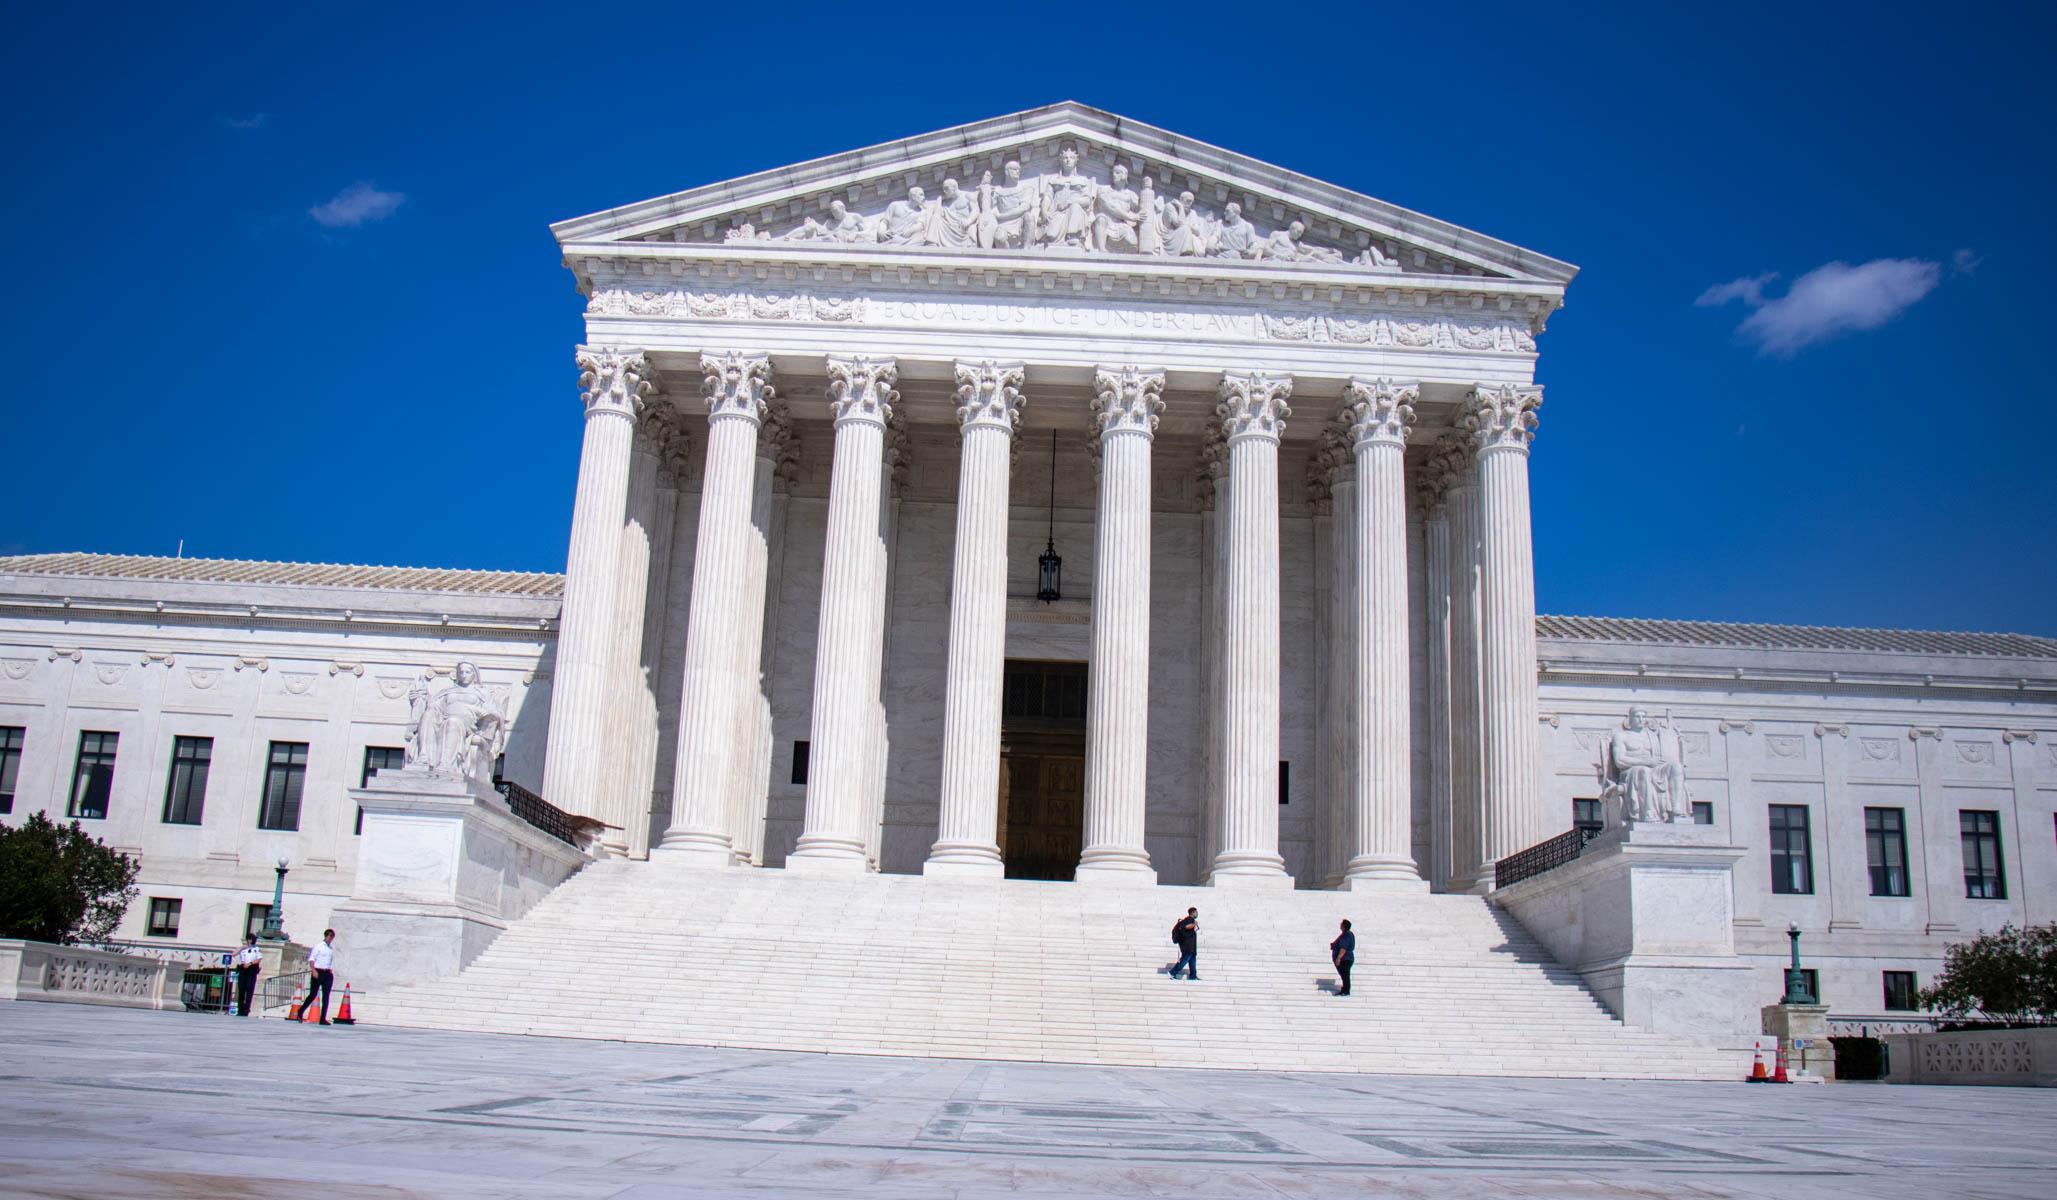 Supreme Court Will Hear Major Abortion Case on December 1